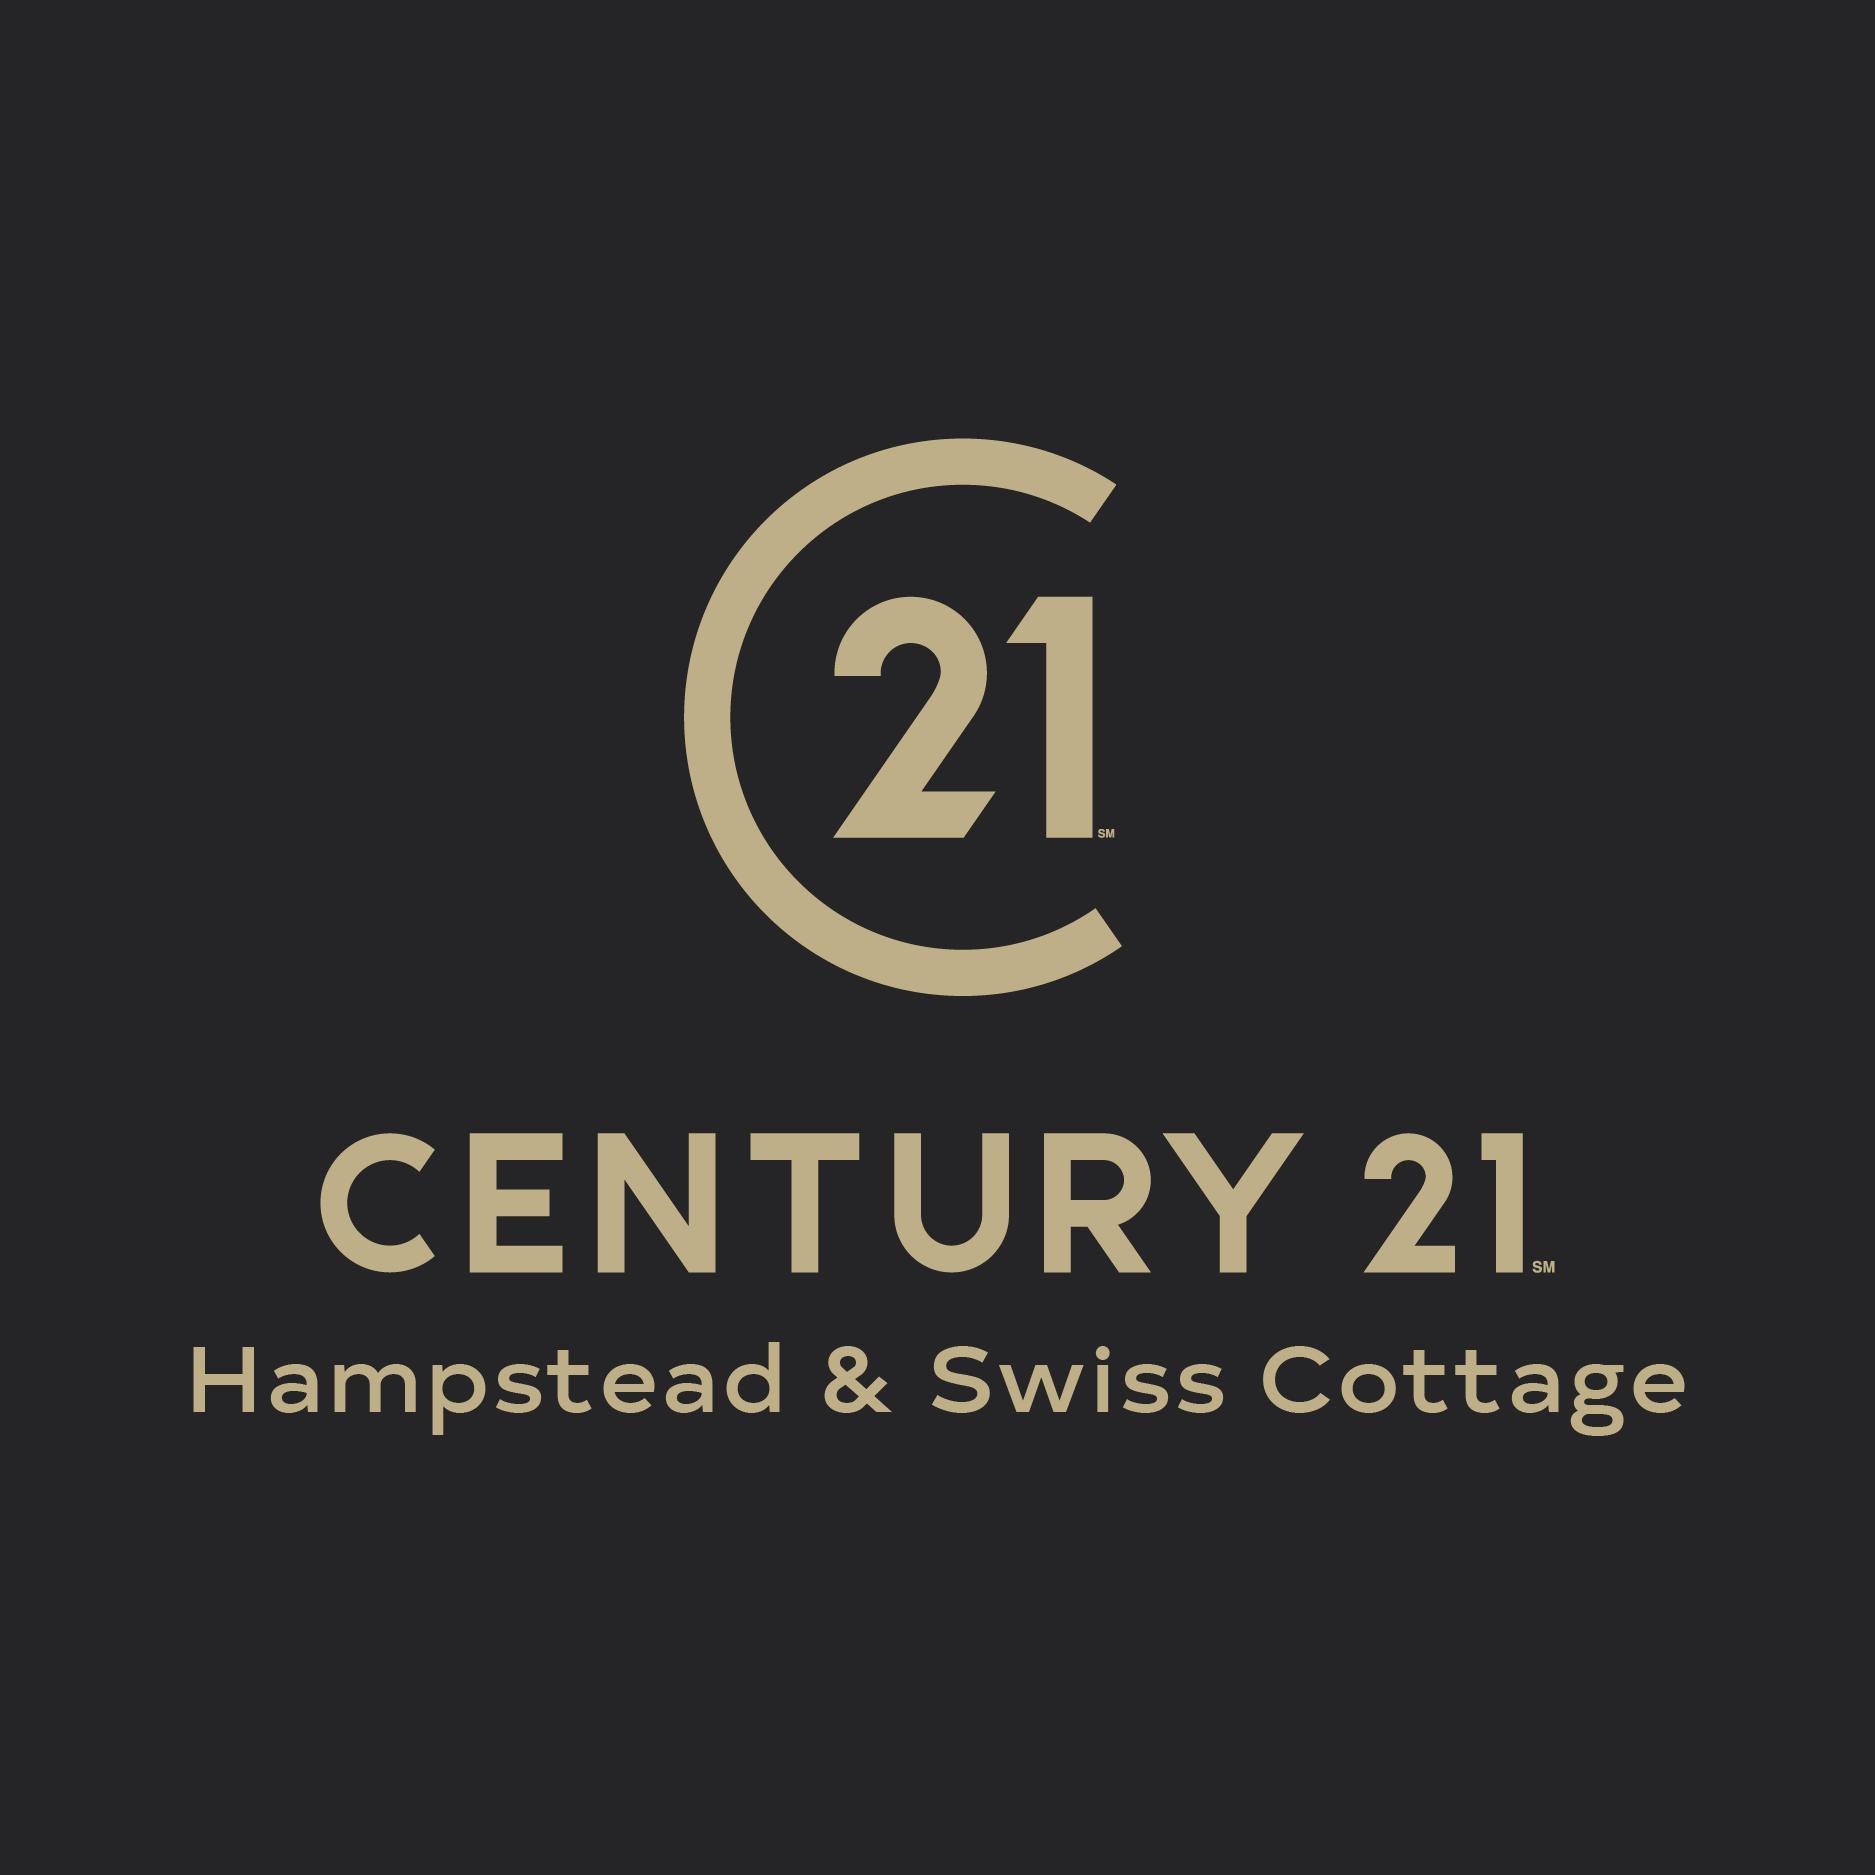 Century 21 - Hampstead & Swiss Cottage